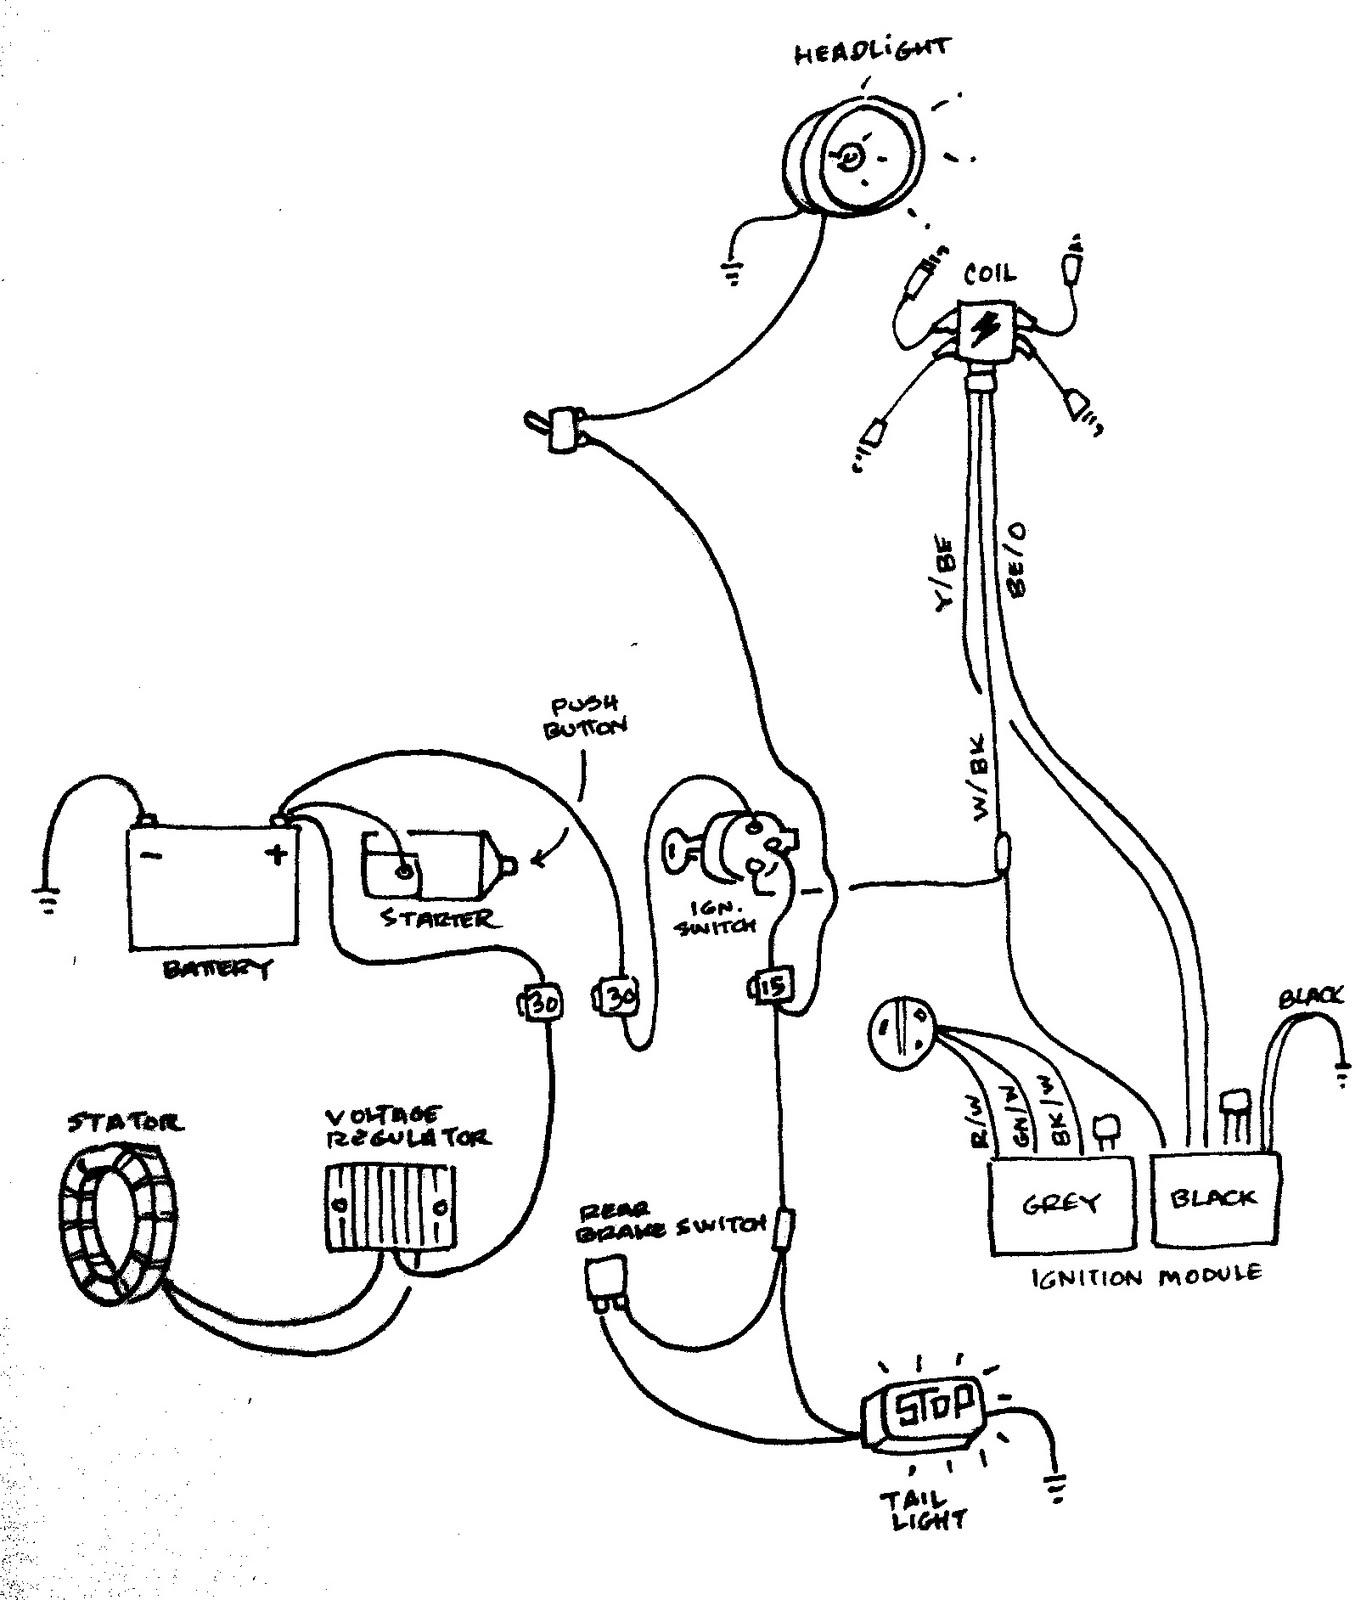 Dirt Bike Wiring Diagram Basic Trusted Diagrams Shineray Atv Harness Kpx Search For U2022 X2 Pocket